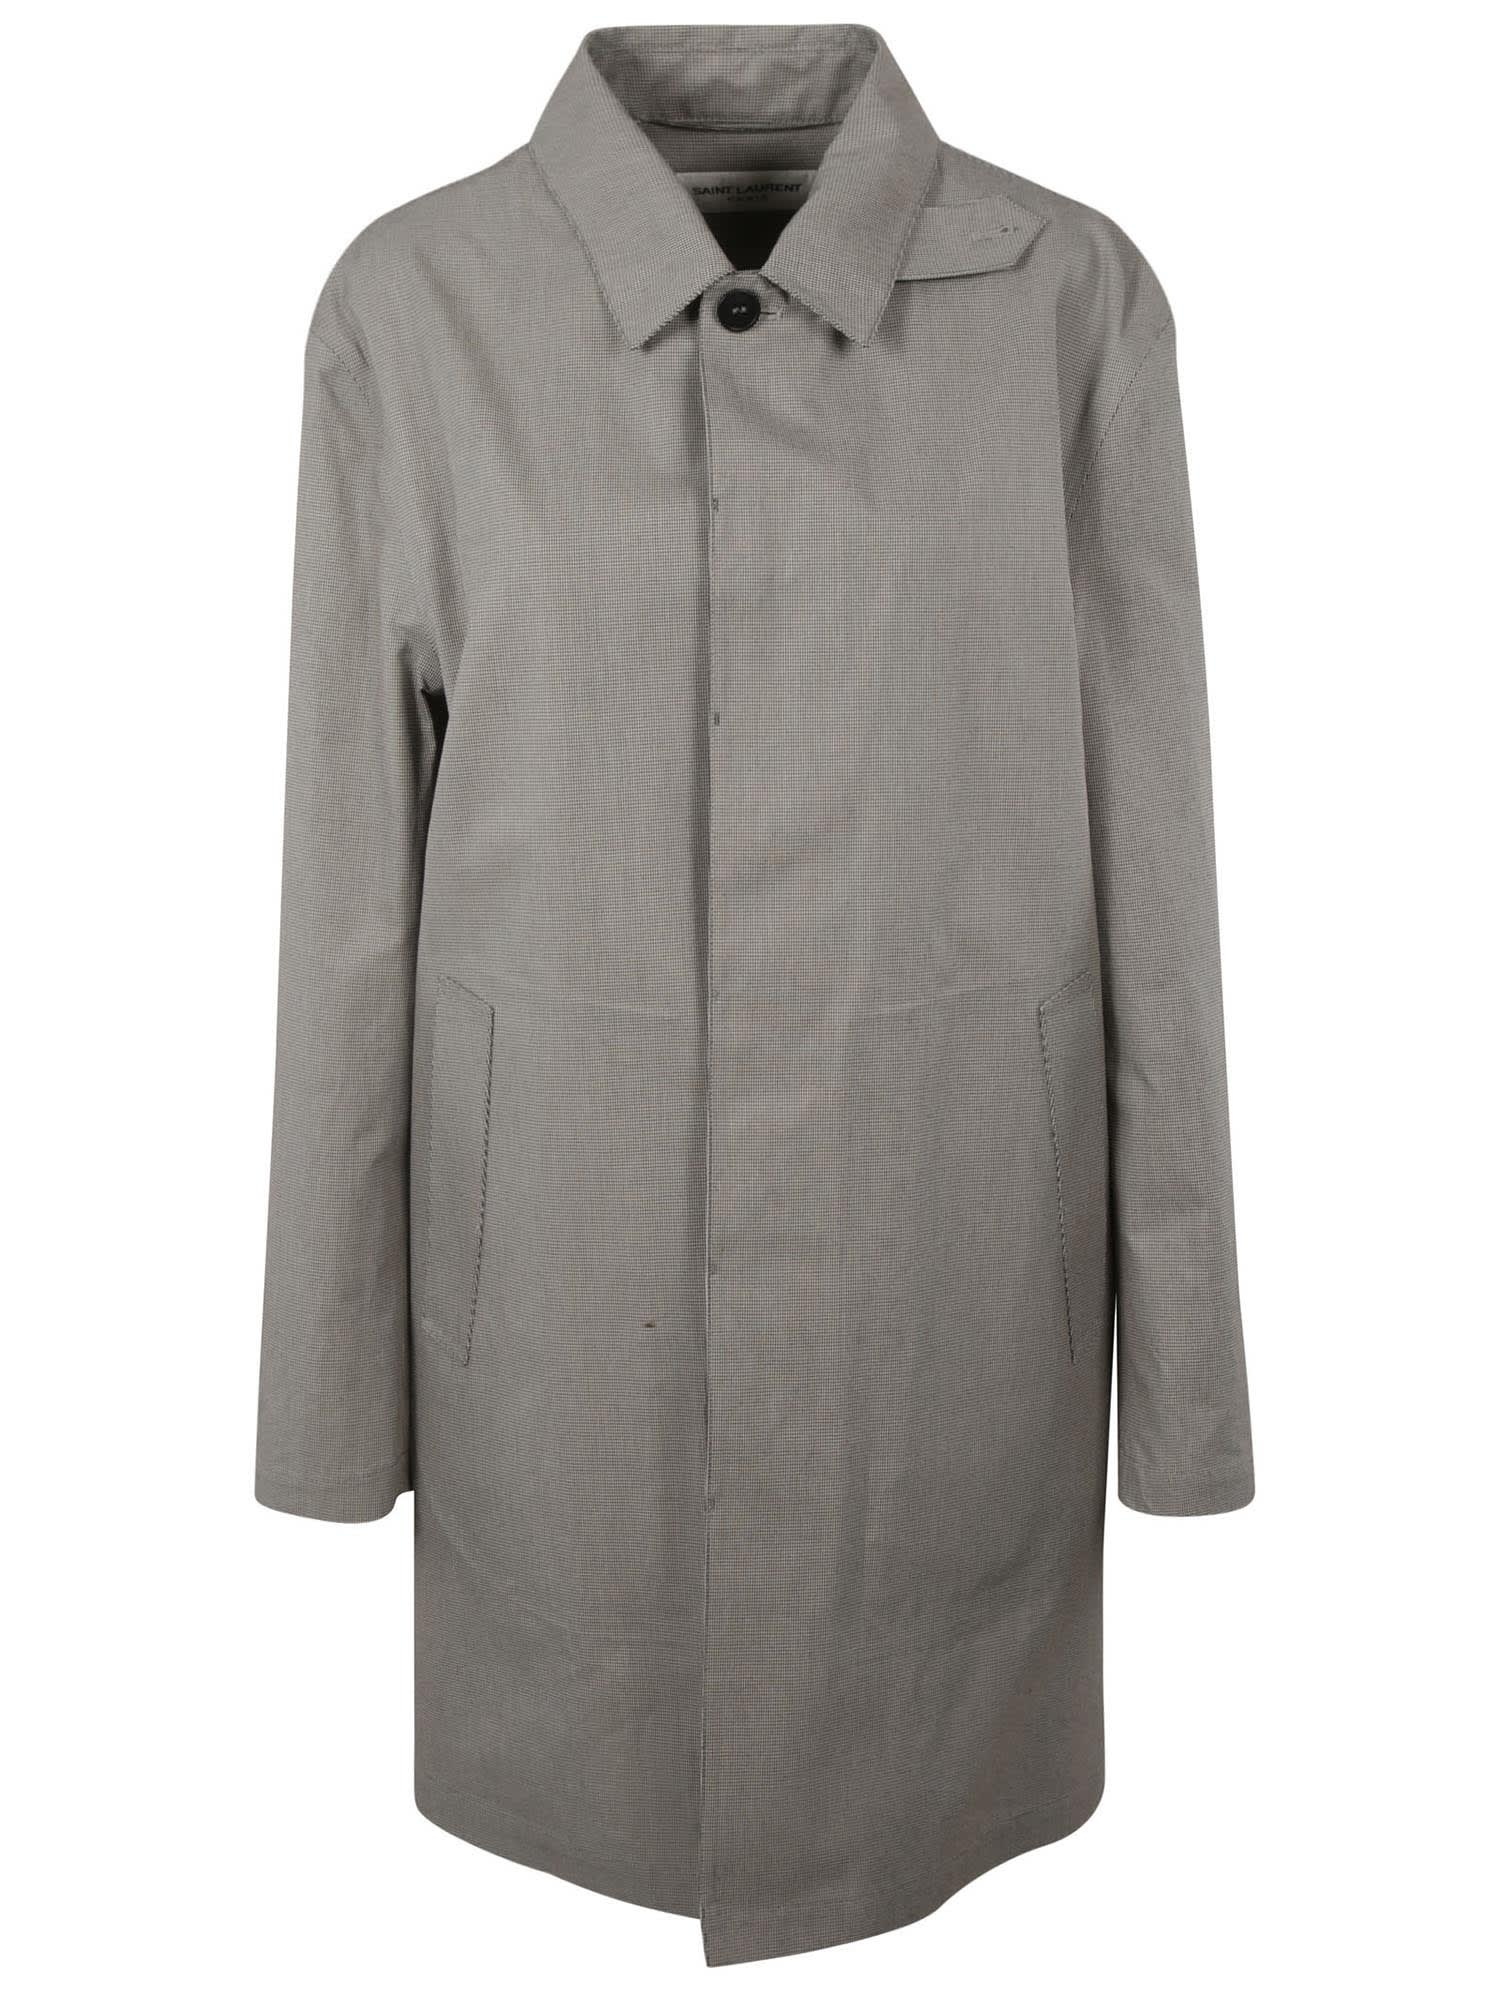 Saint Laurent Houndstooth Raincoat